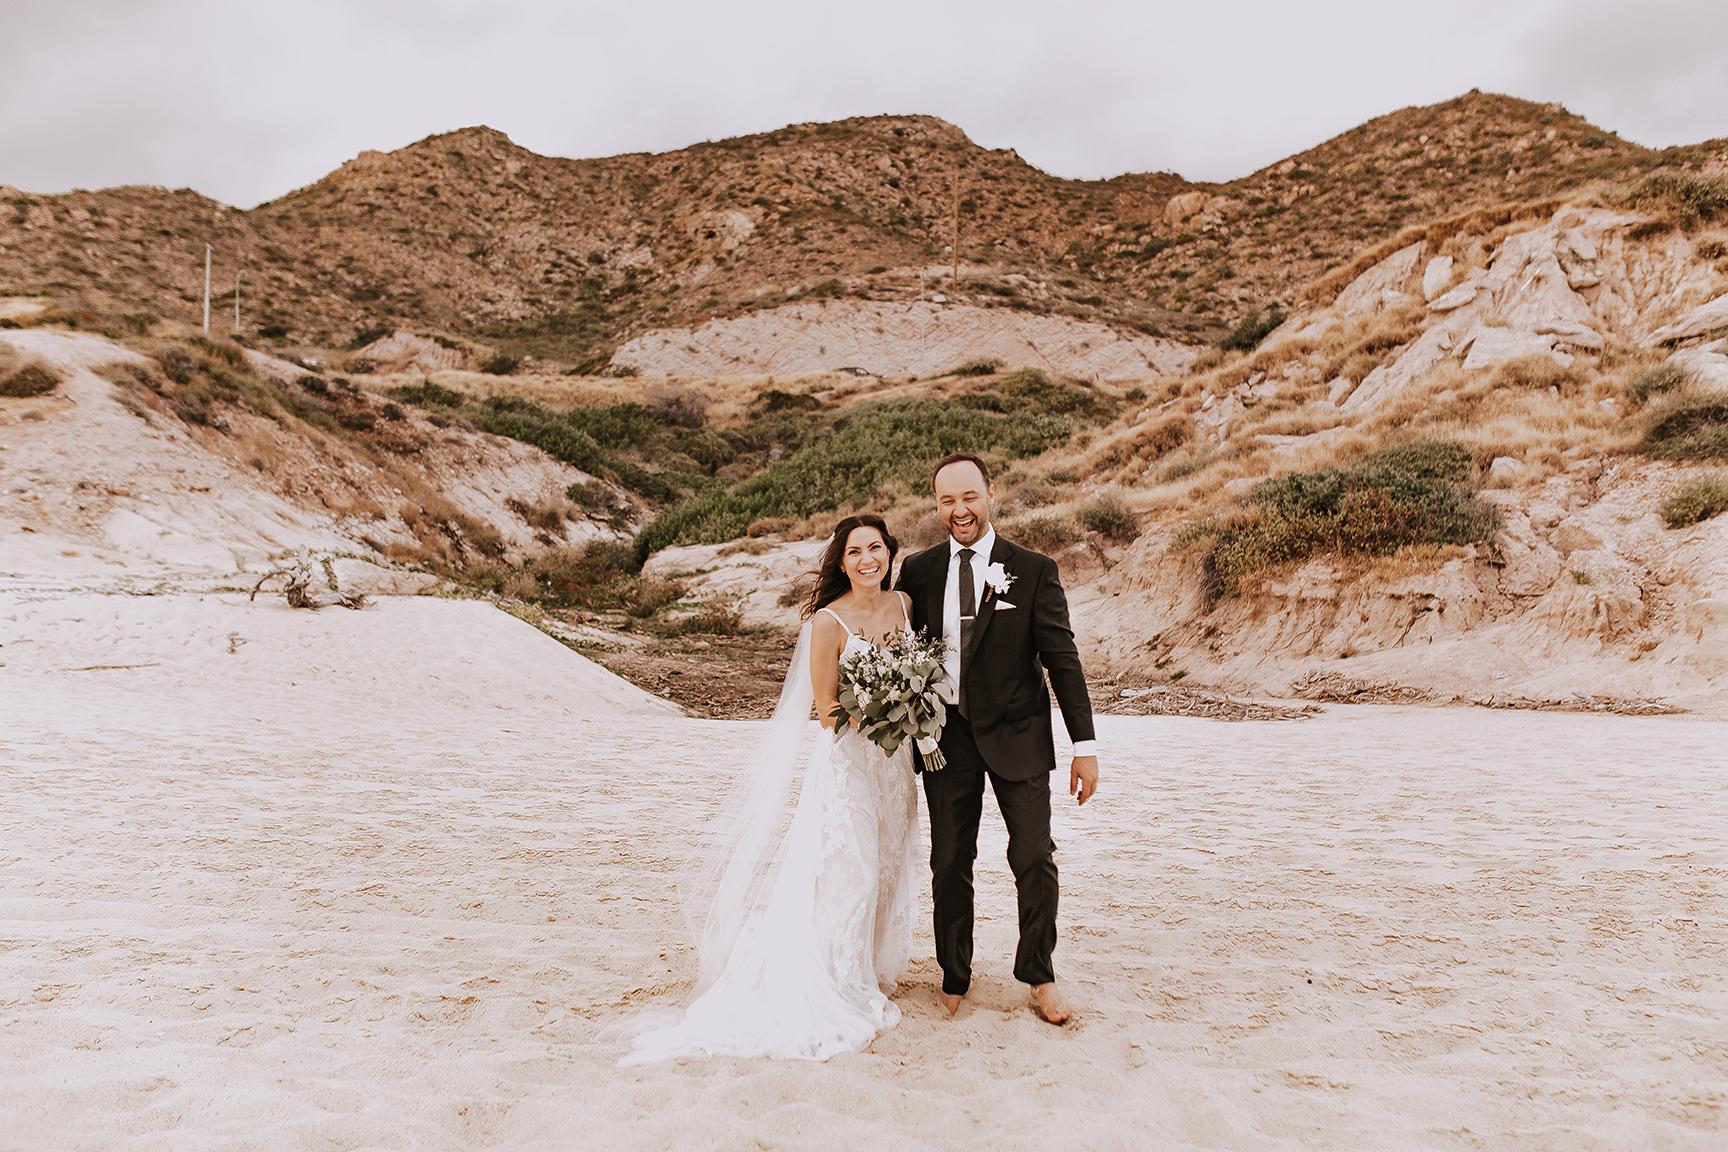 Lindsei+James_cabo_wedding_628.jpg